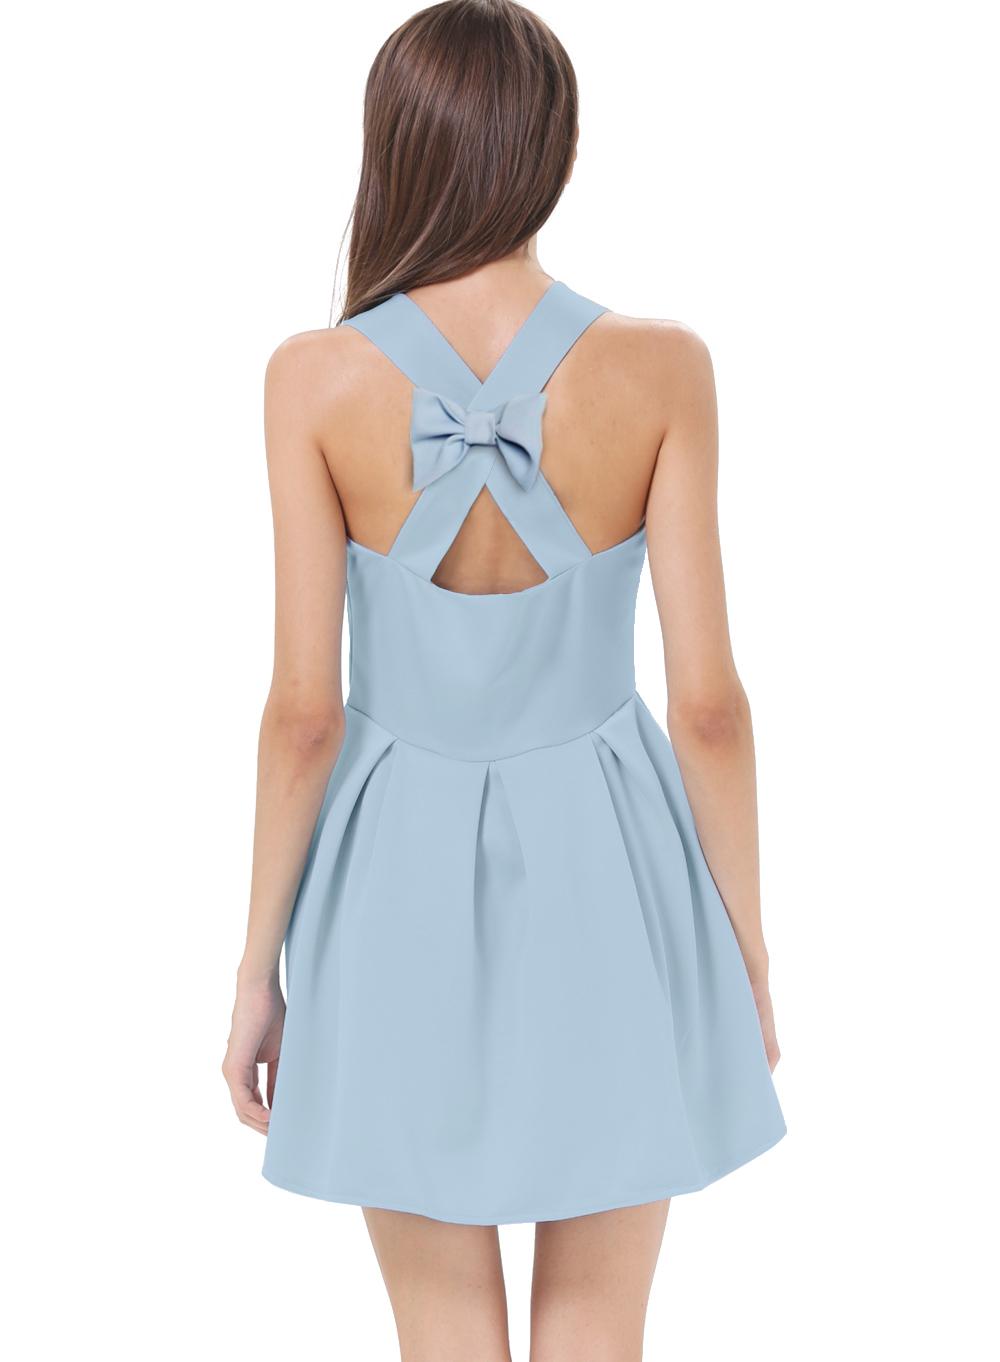 Blue Criss Cross Backless Bow Pleated Dress - Sheinside.com